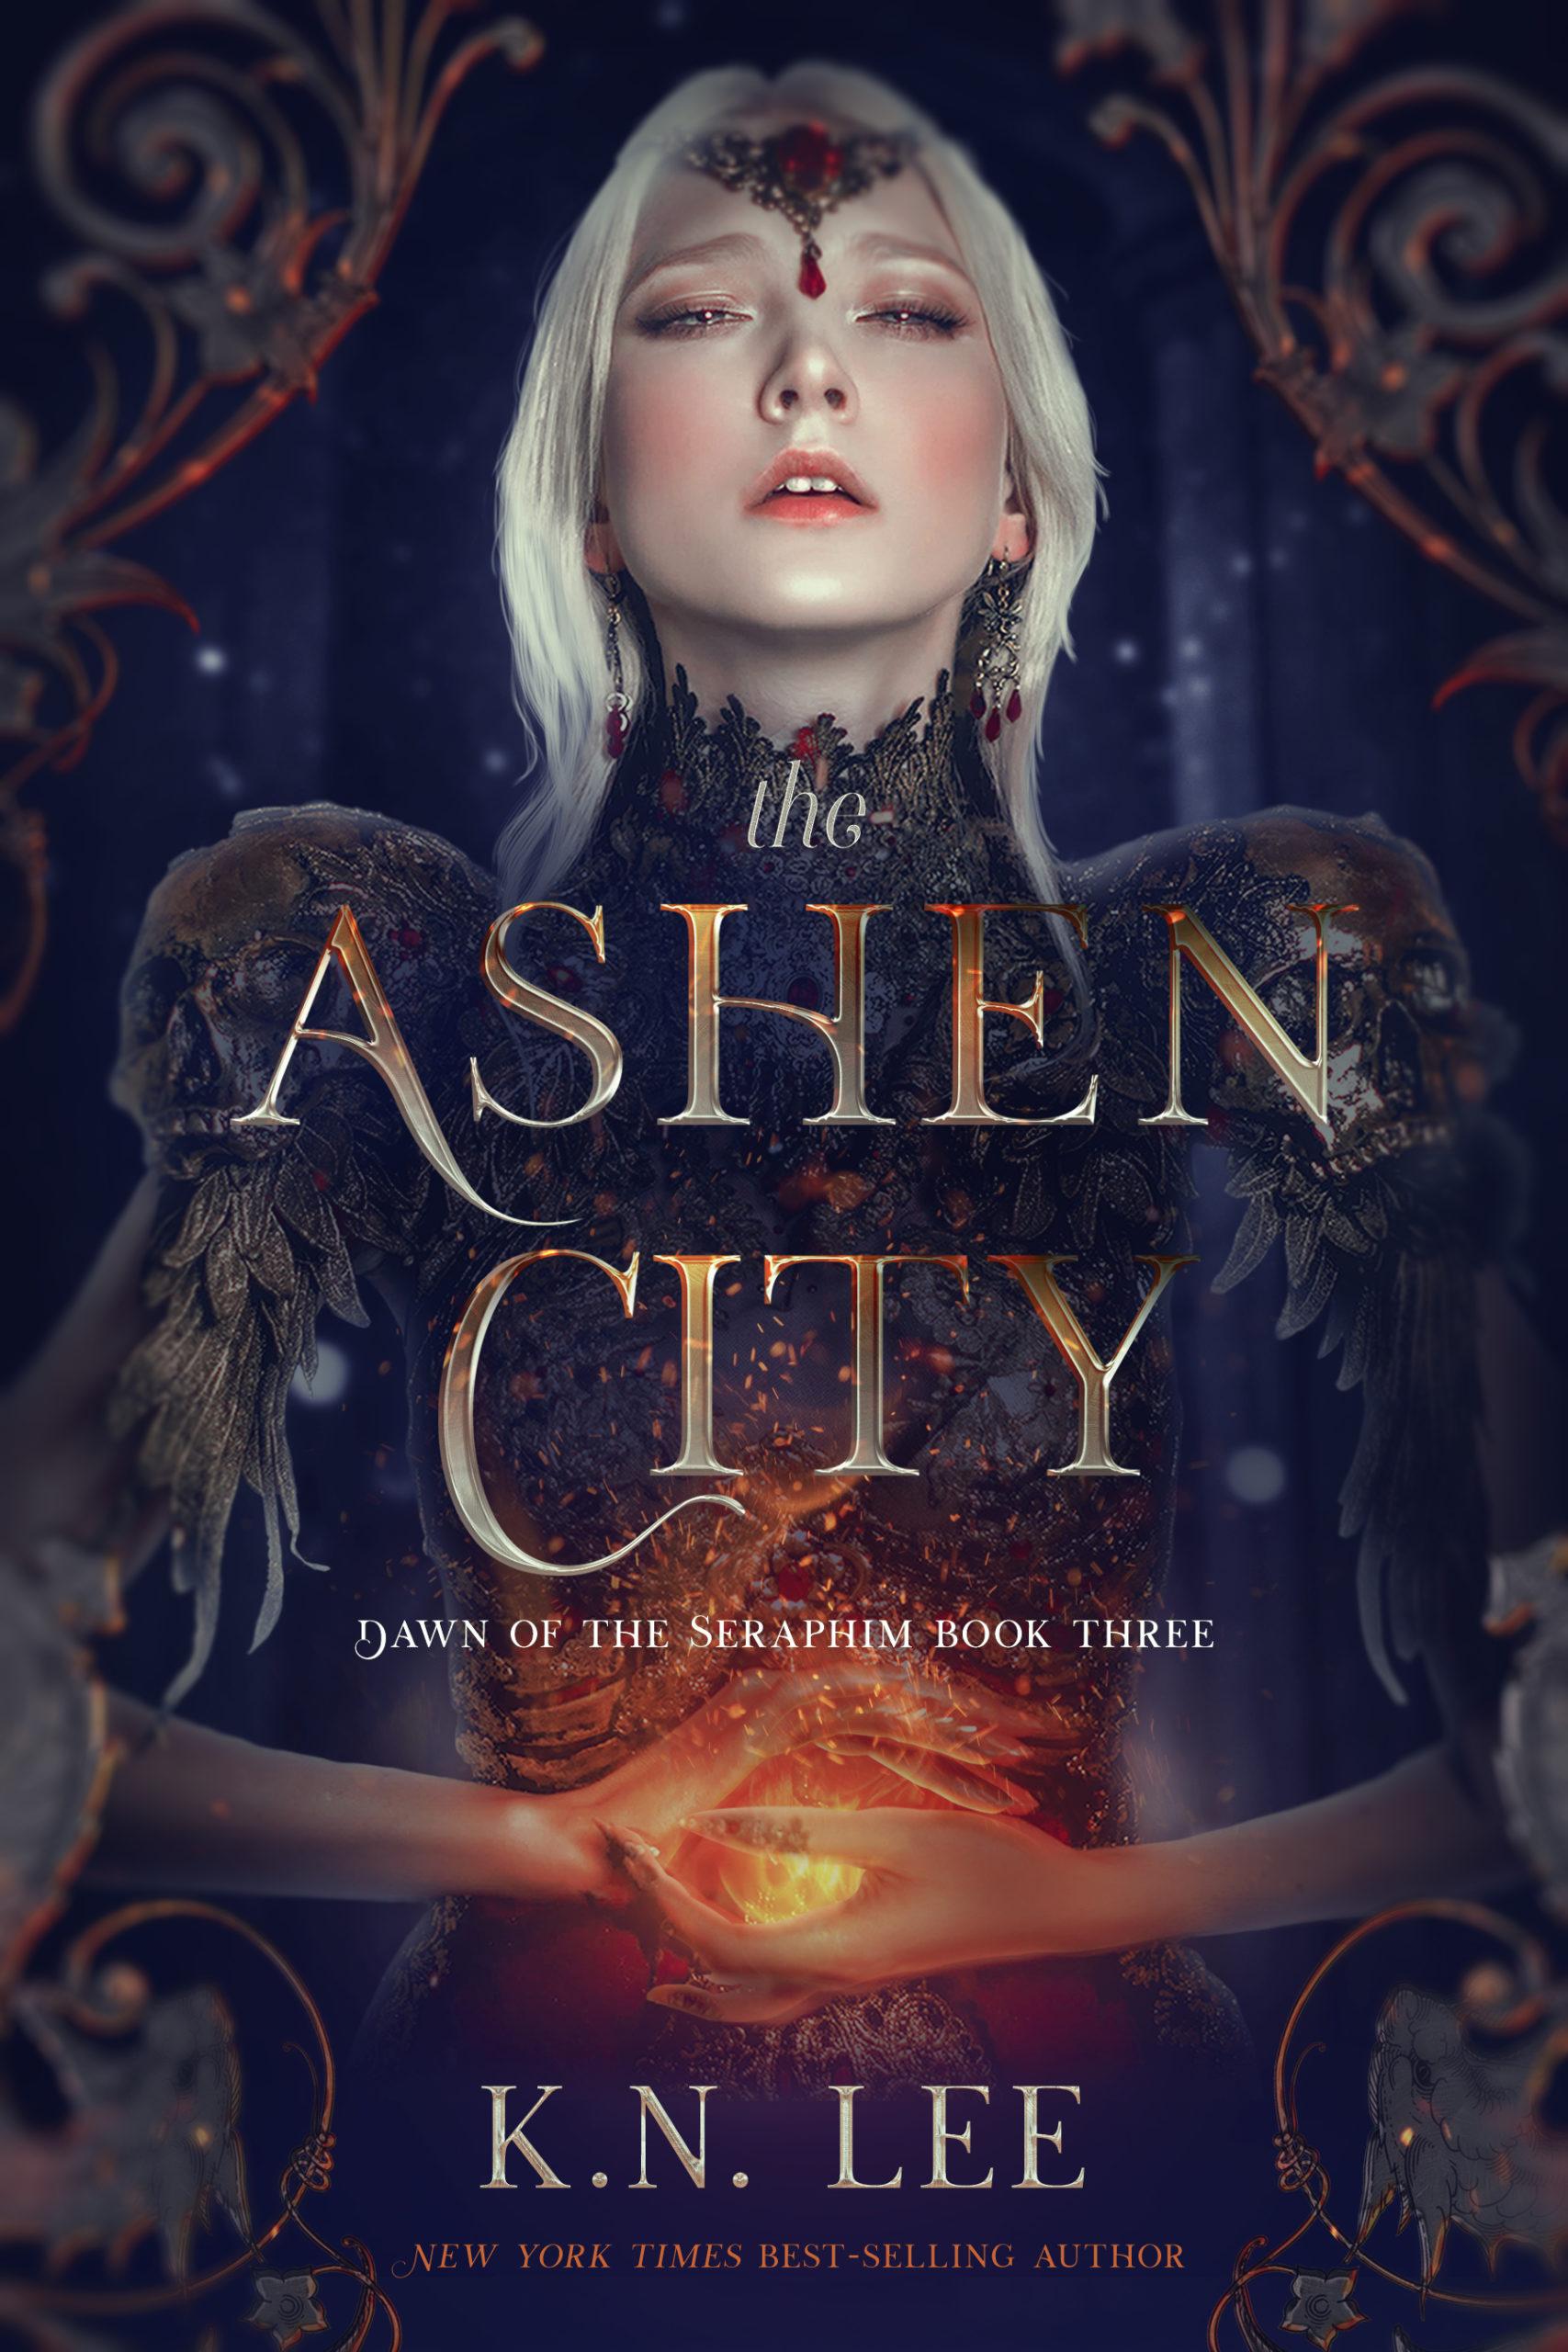 AshenCity